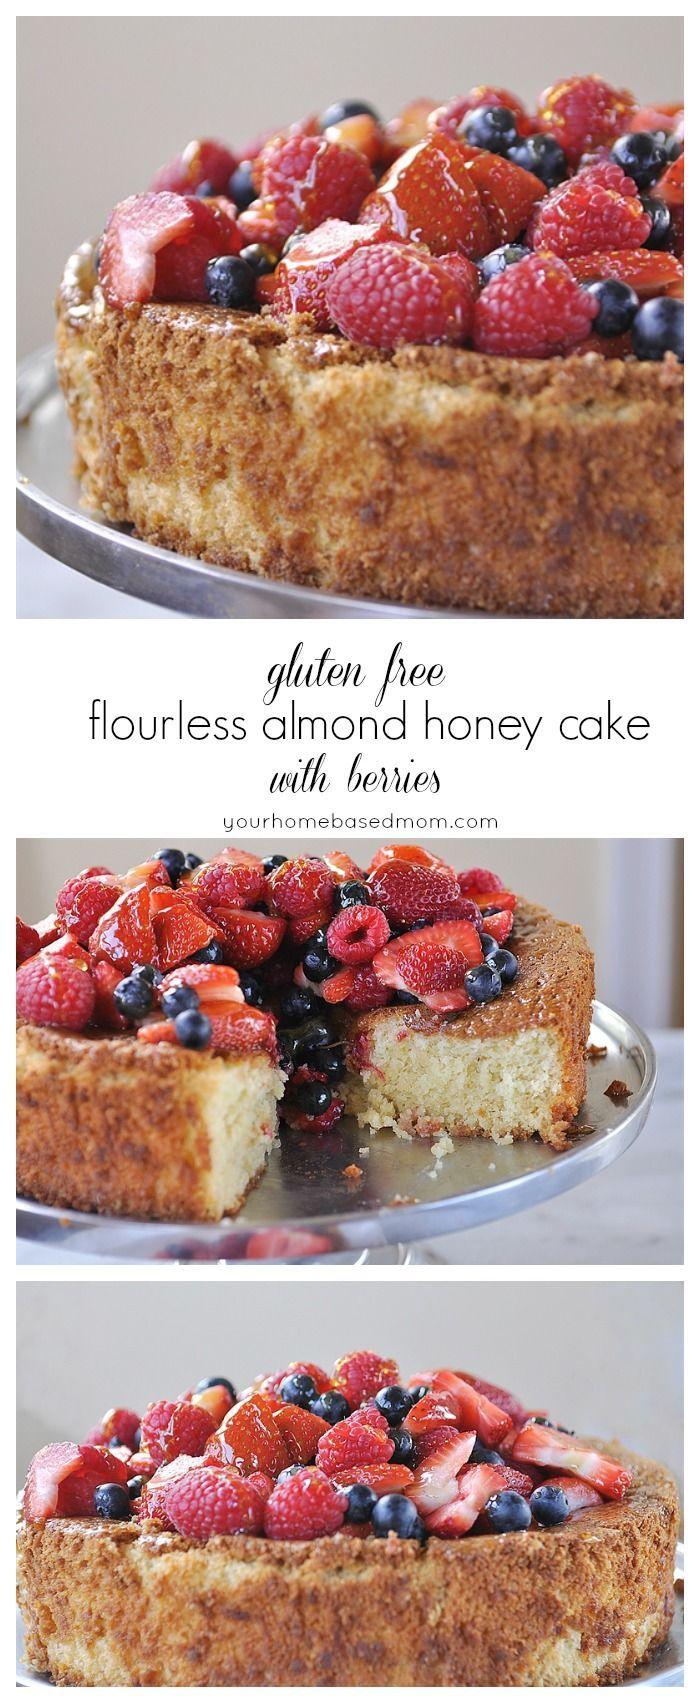 gluten free flourless almond honey cake with berries - it's amazing!!! No one will know it's gluten free @yourhomebasedmom.com